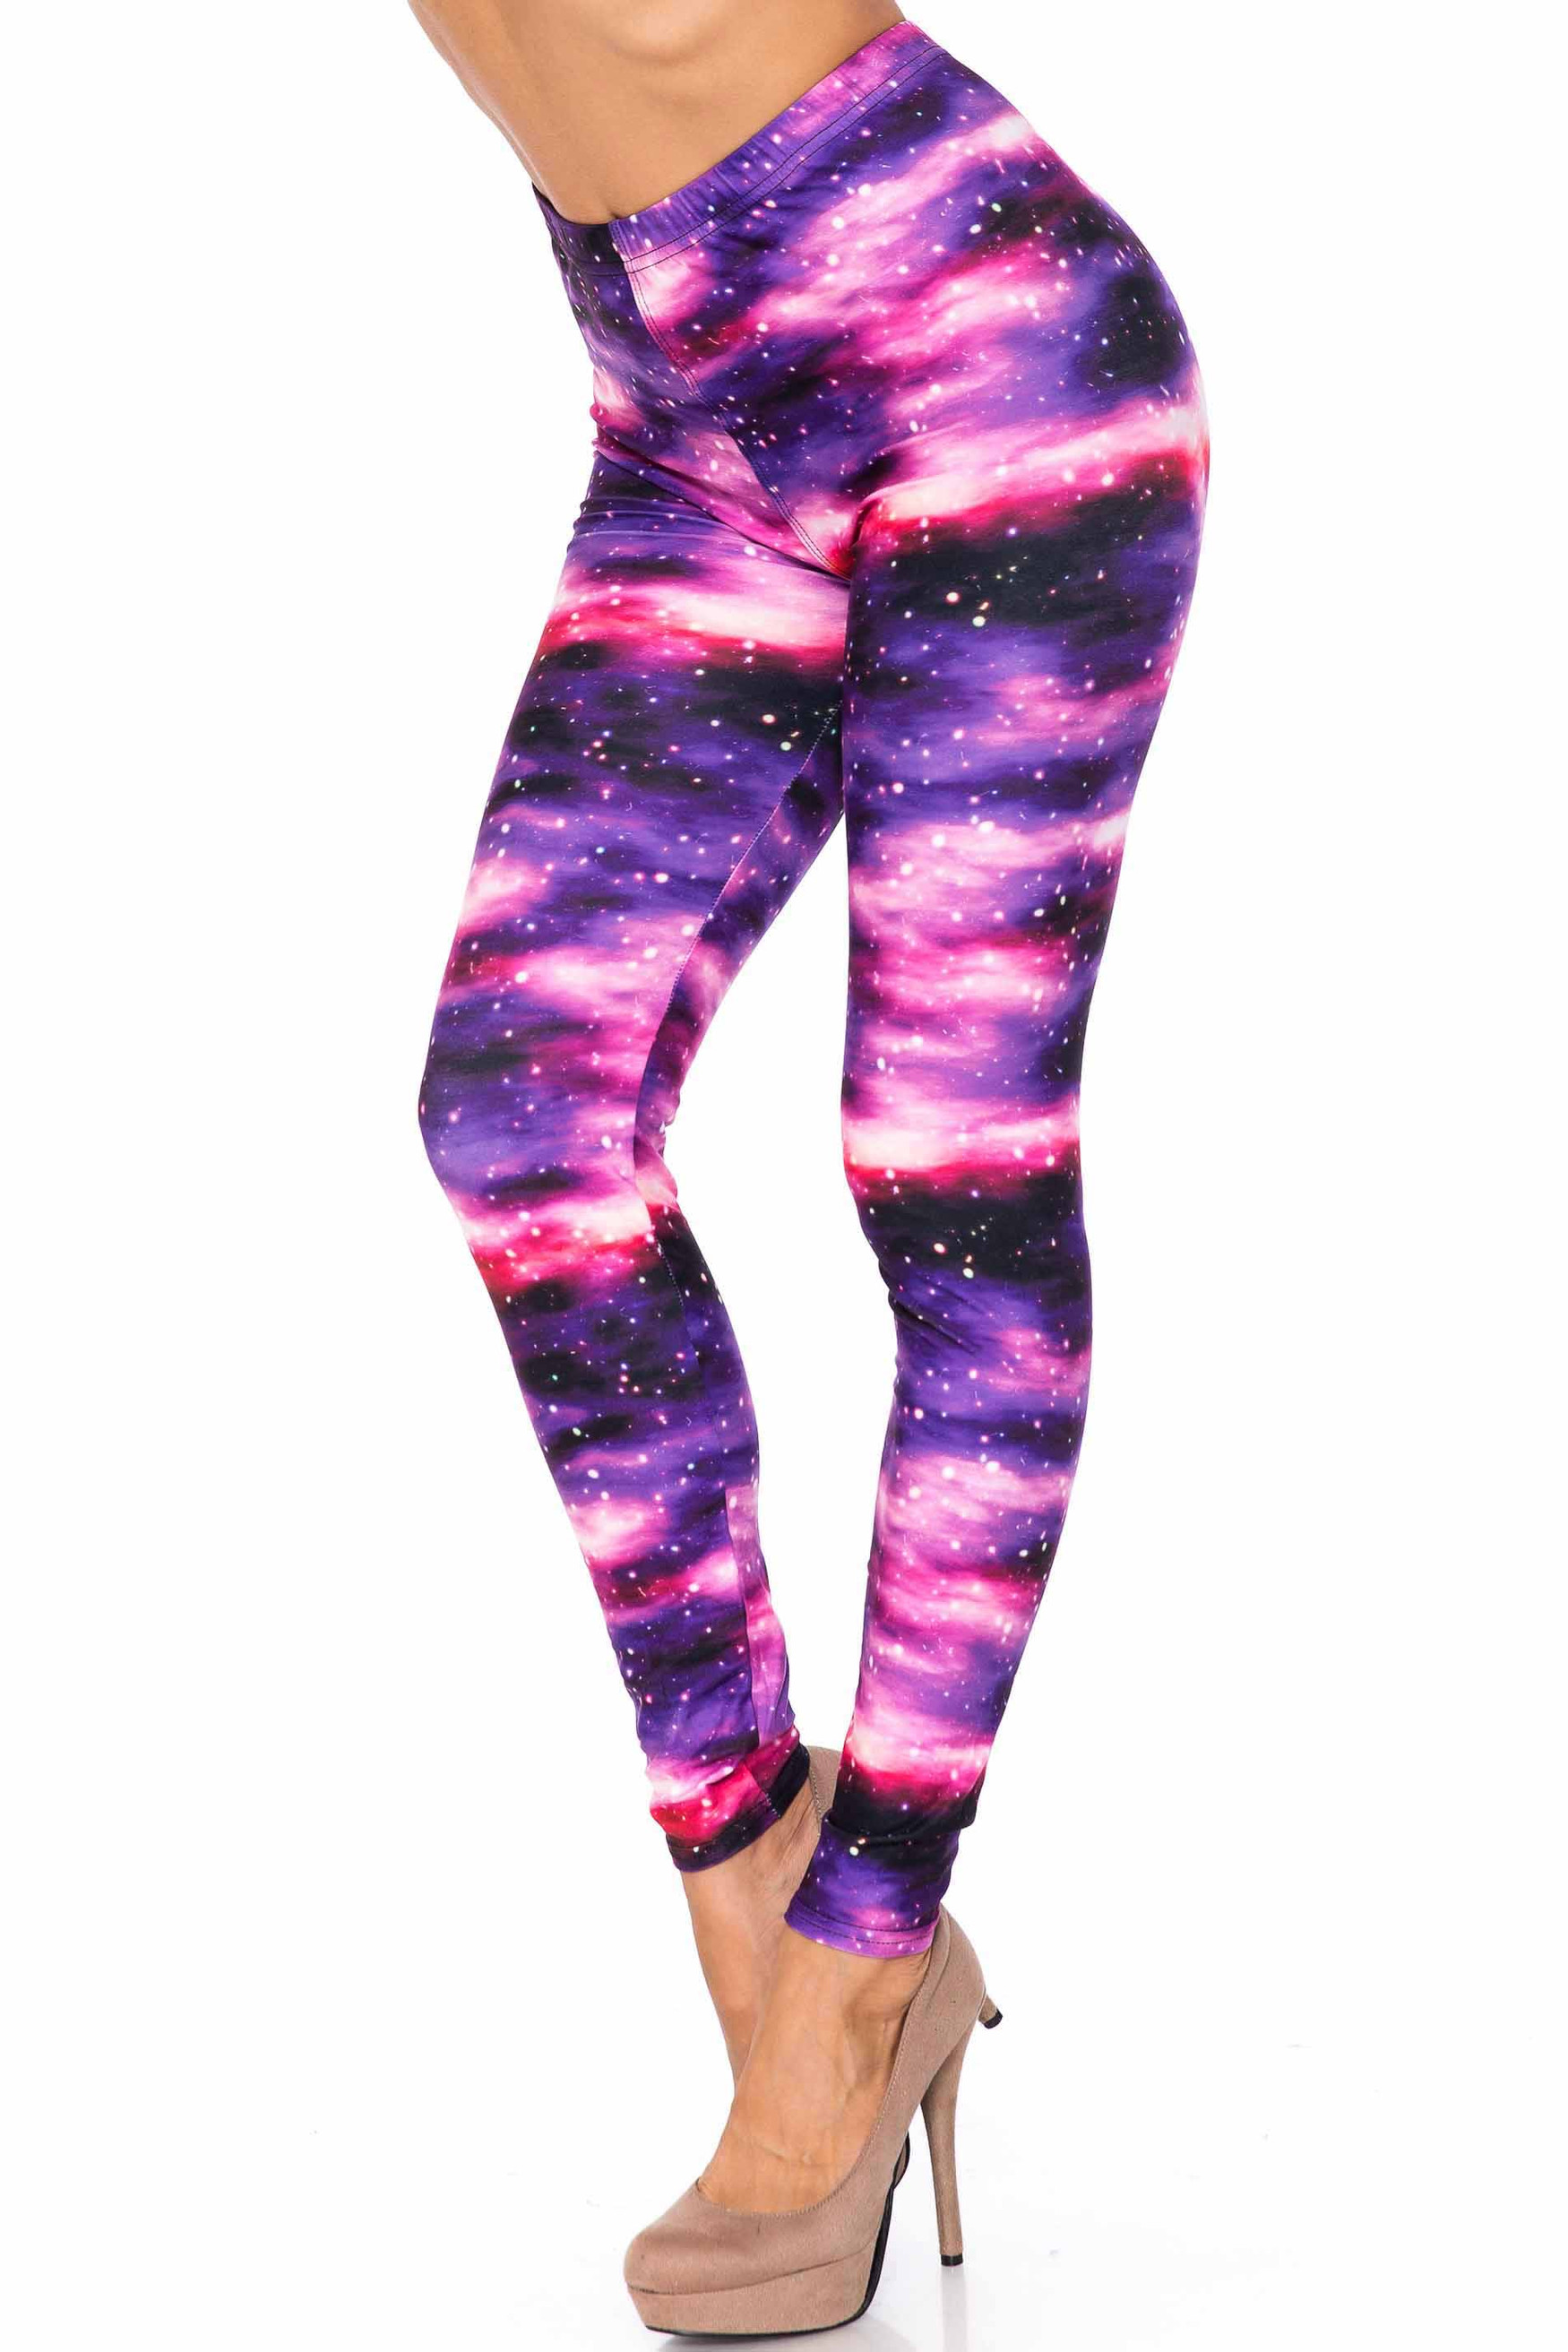 Creamy Soft Purple Mist Leggings - USA Fashion™